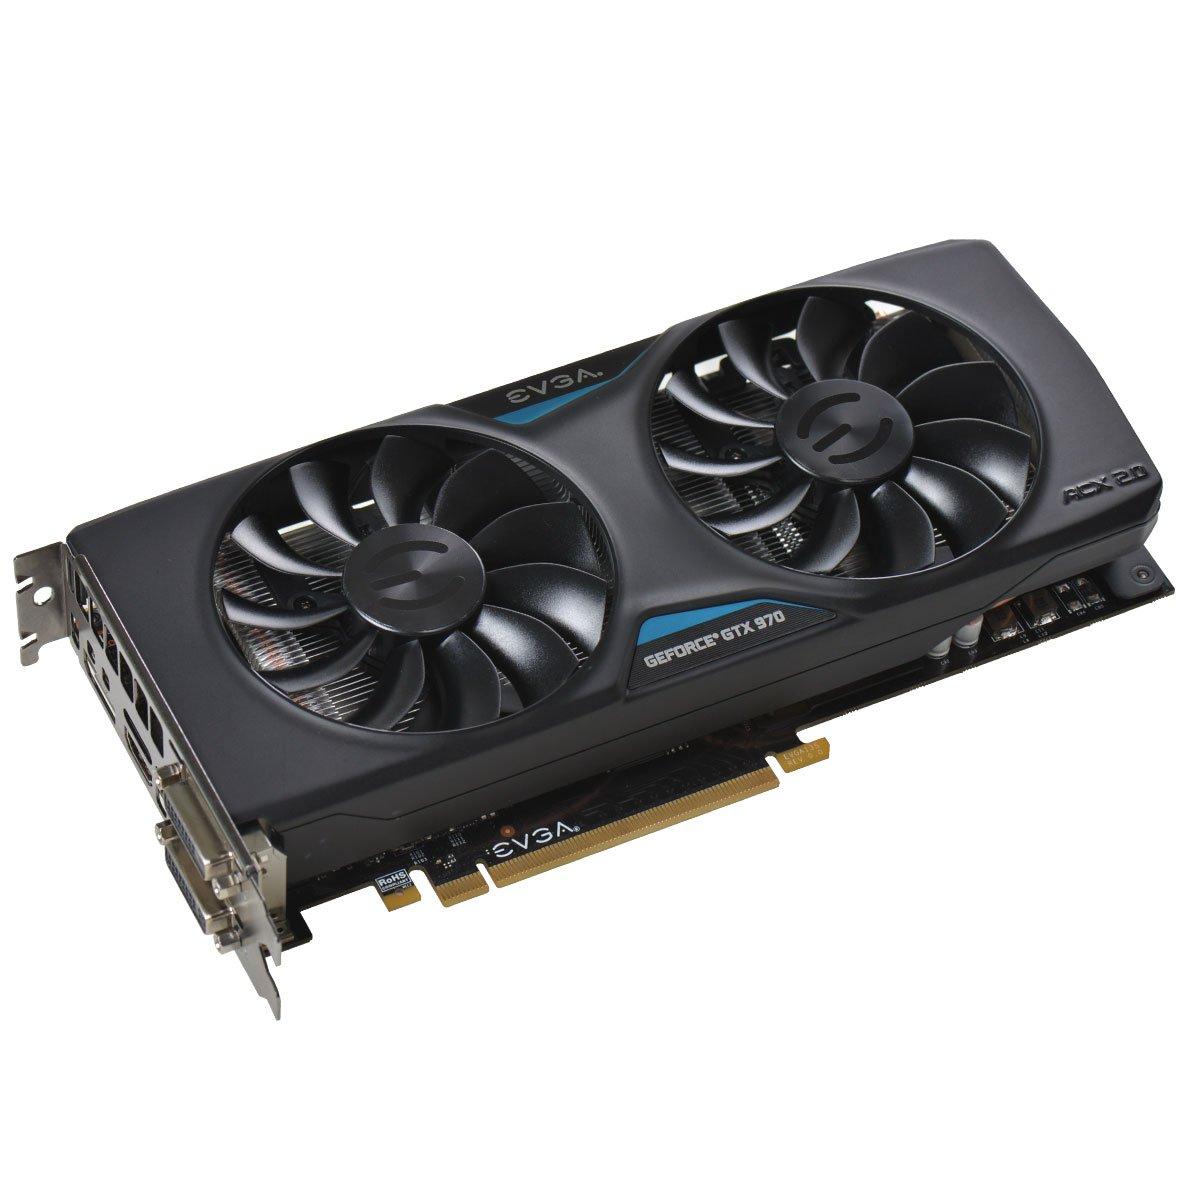 EVGA 04G-P4-2974-KR - Tarjeta gráfica (GeForce GTX 970, 4096 ...